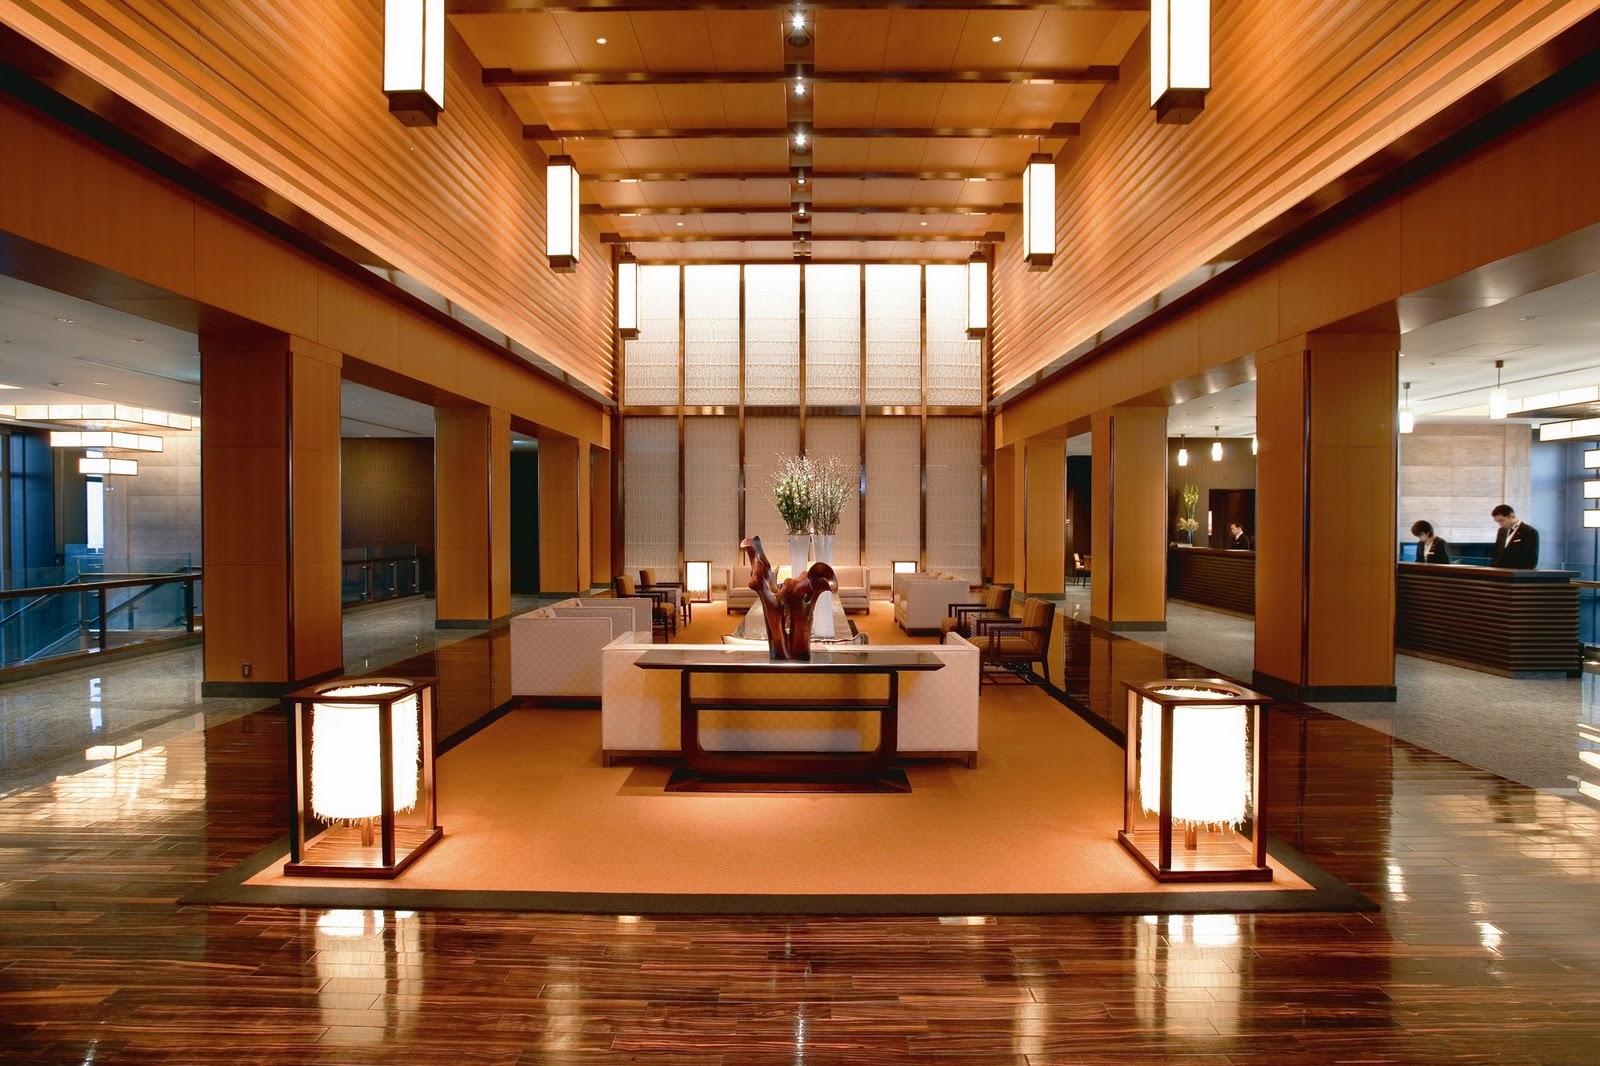 insiders vacation guide tokyo hotel news mandarin oriental tokyo 5th anniversary. Black Bedroom Furniture Sets. Home Design Ideas